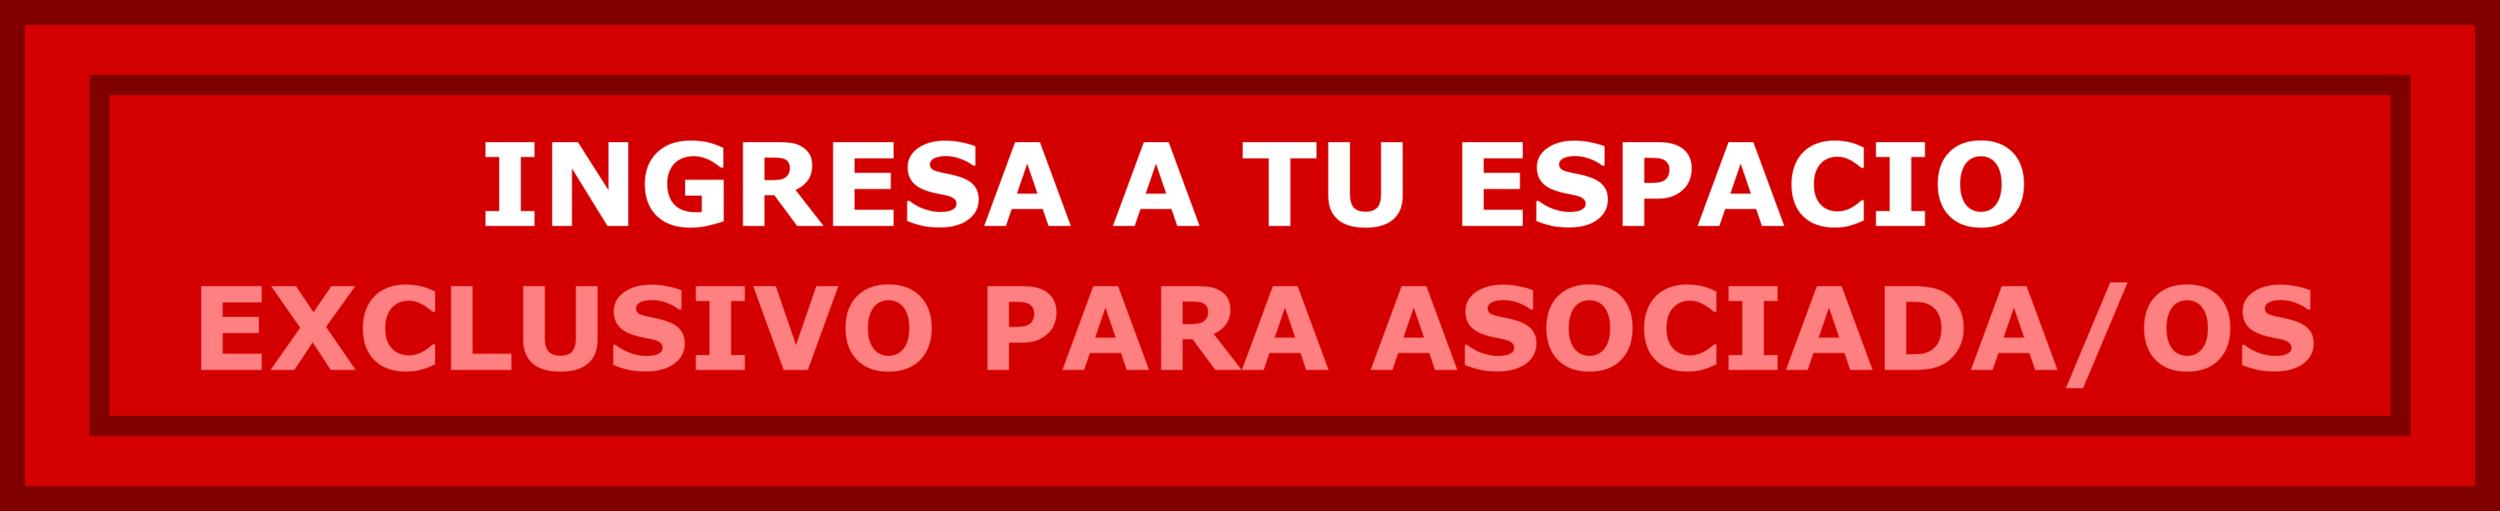 EXCLUSIVO PARA ASOCIADAS.png